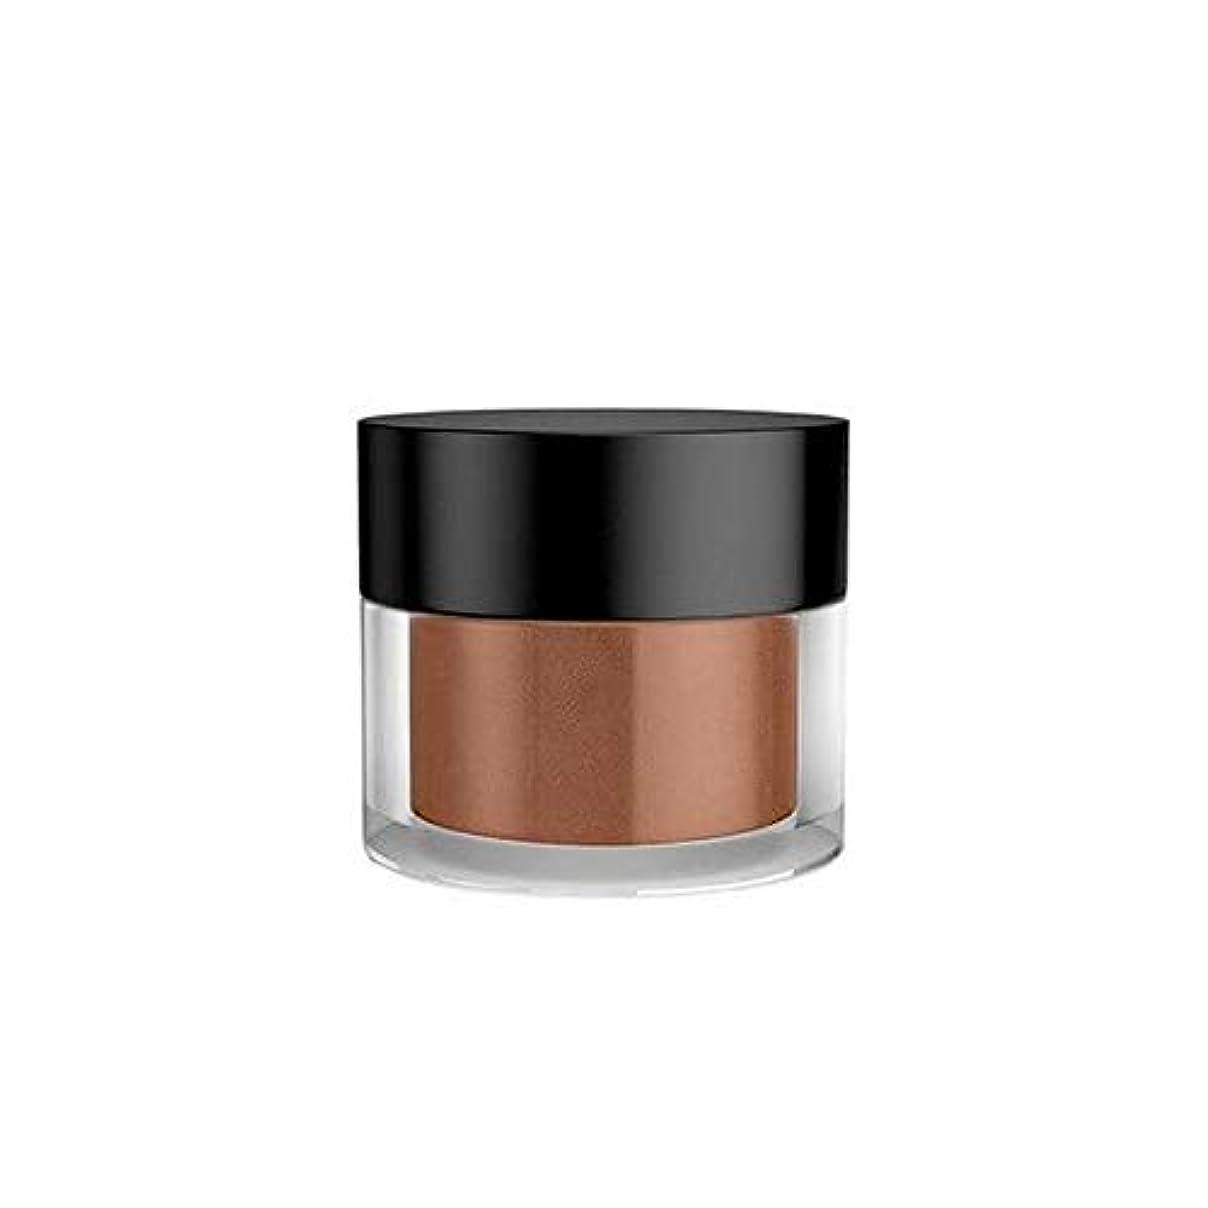 [GOSH ] おやっエフェクトパウダーミンク003 - Gosh Effect Powder Mink 003 [並行輸入品]